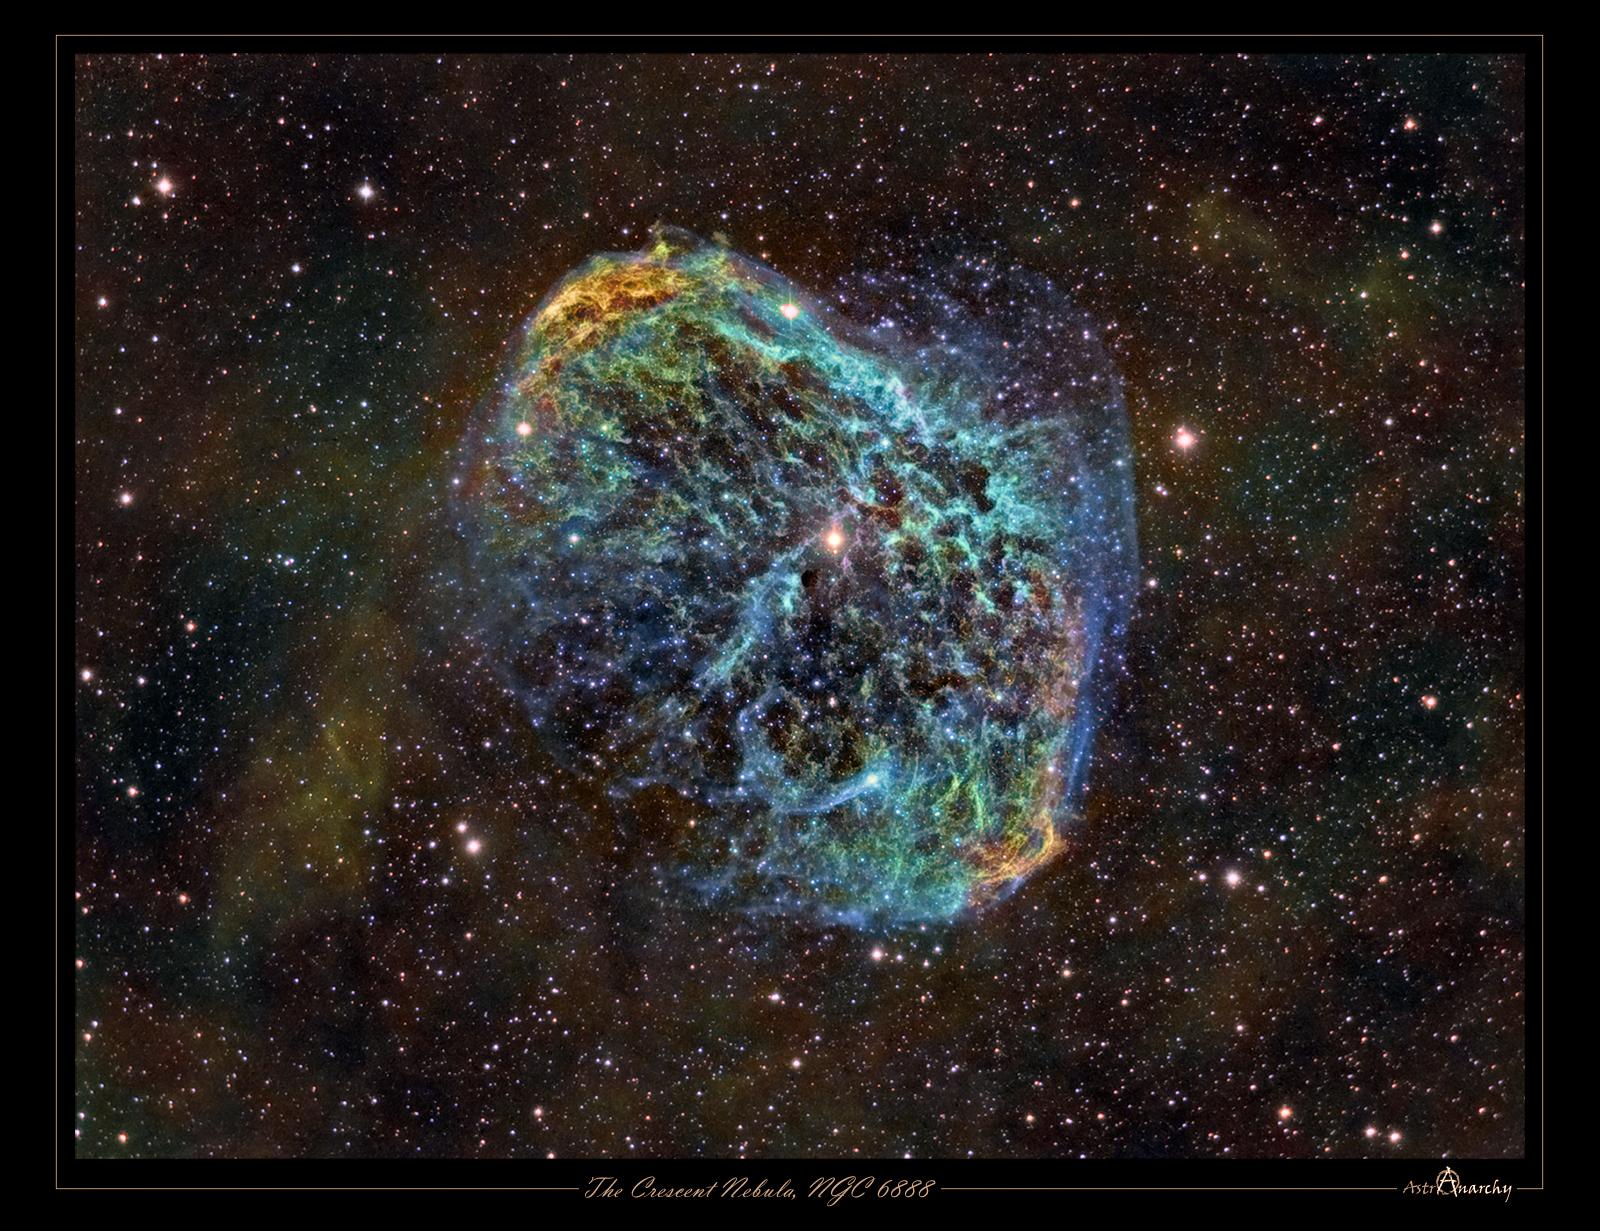 2012 August 16 - NGC 6888: The Crescent Nebula